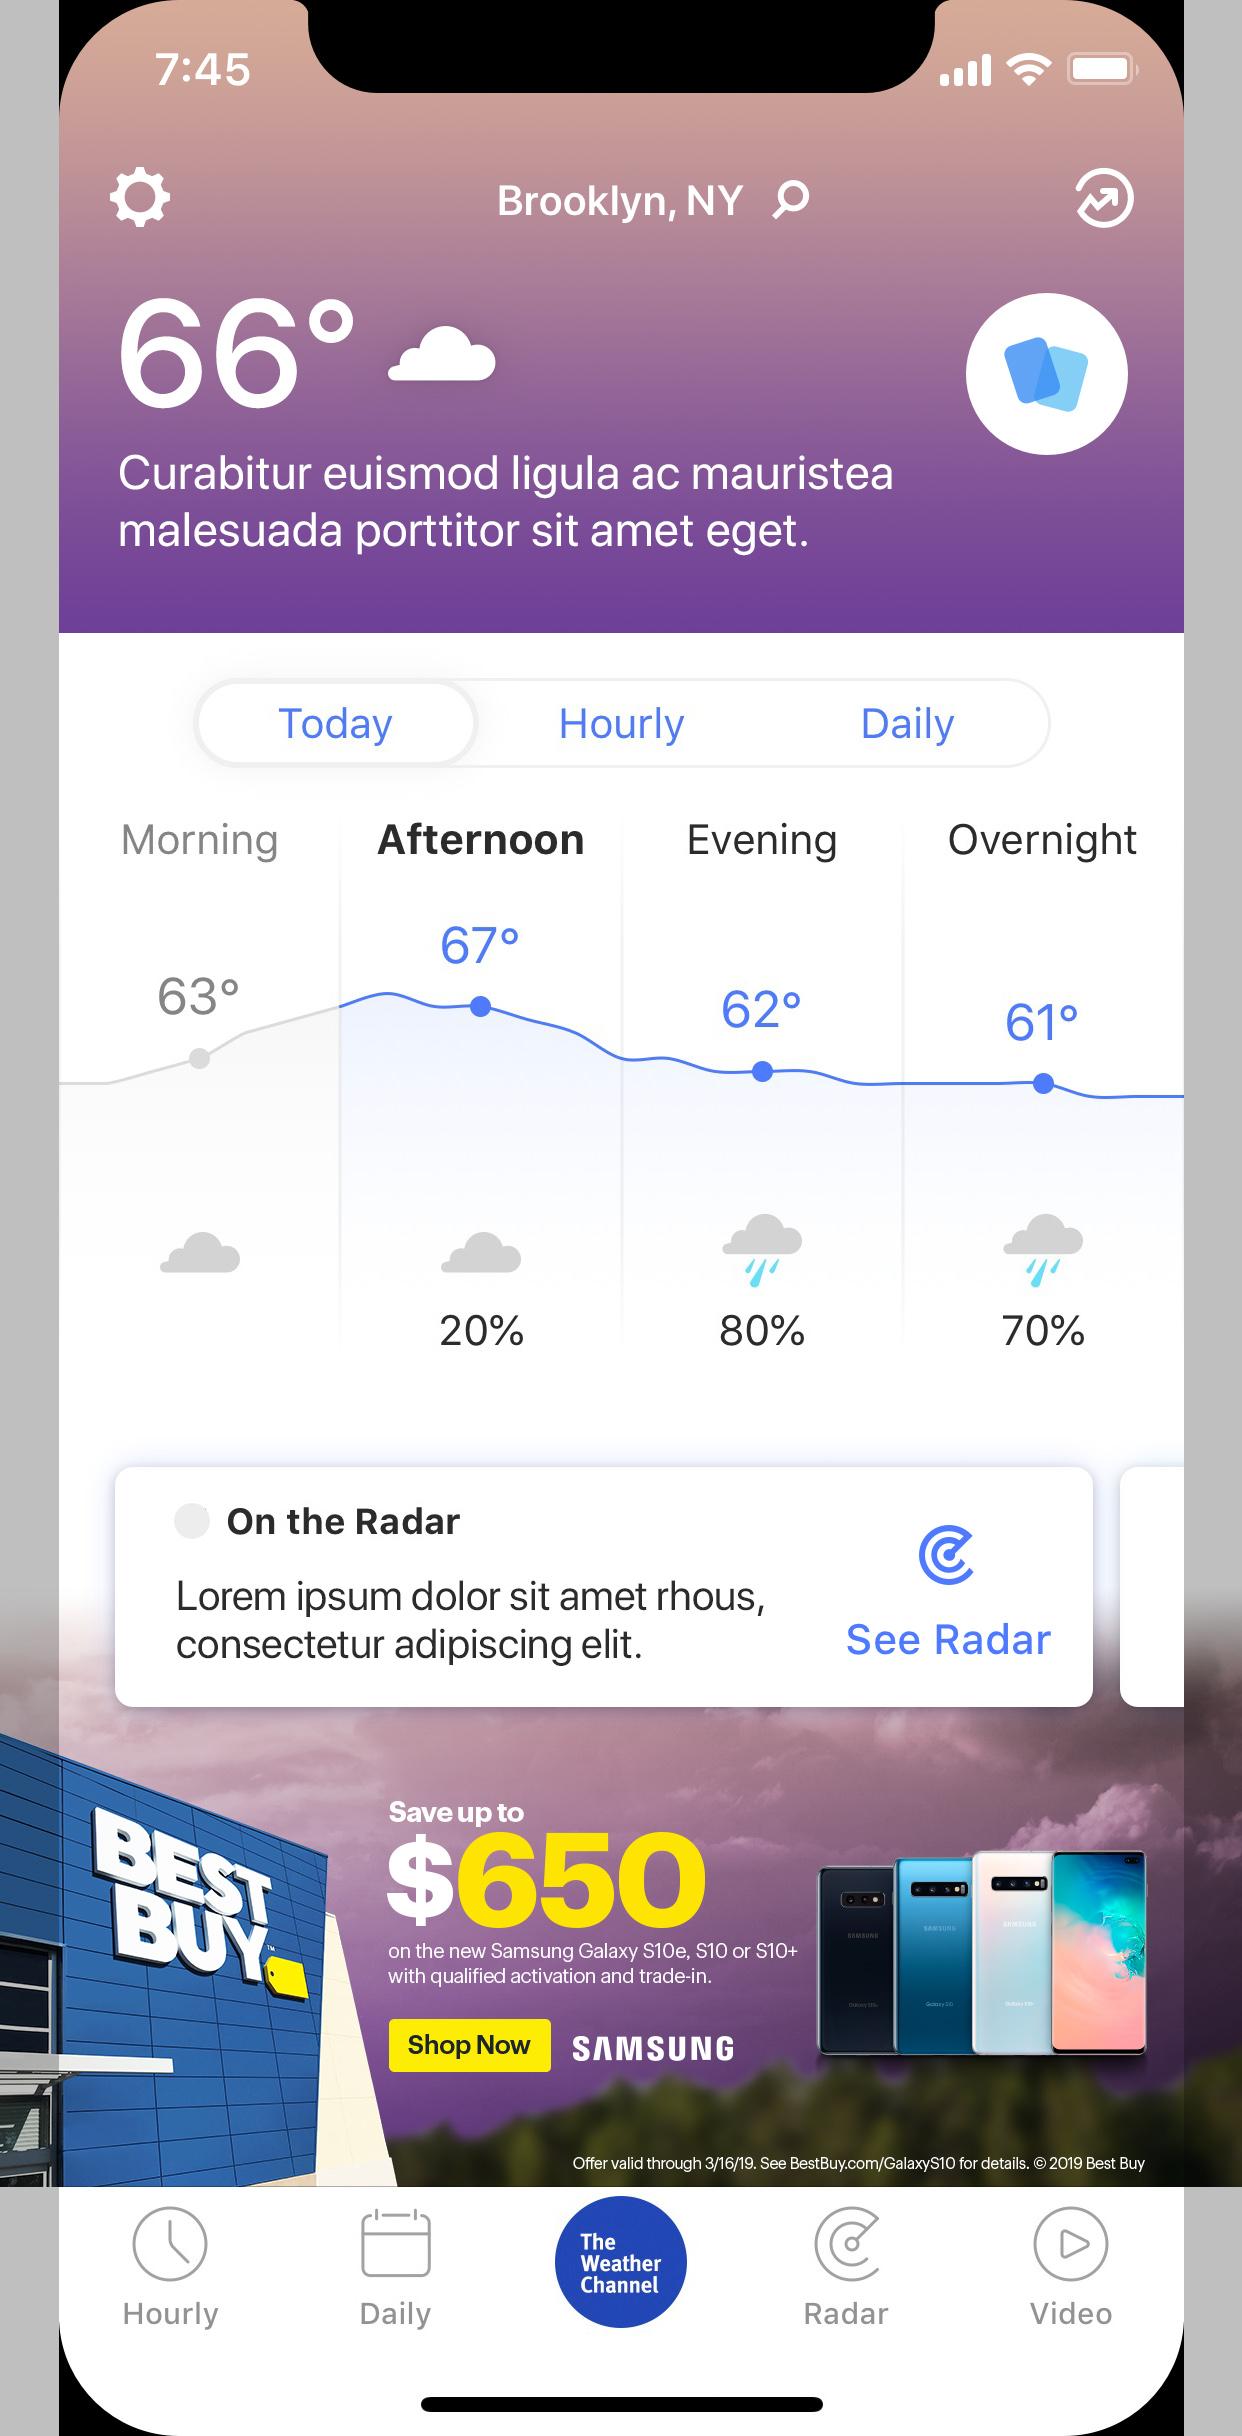 414x240_SamsungBeyond_F2L1_Cloudy_Day